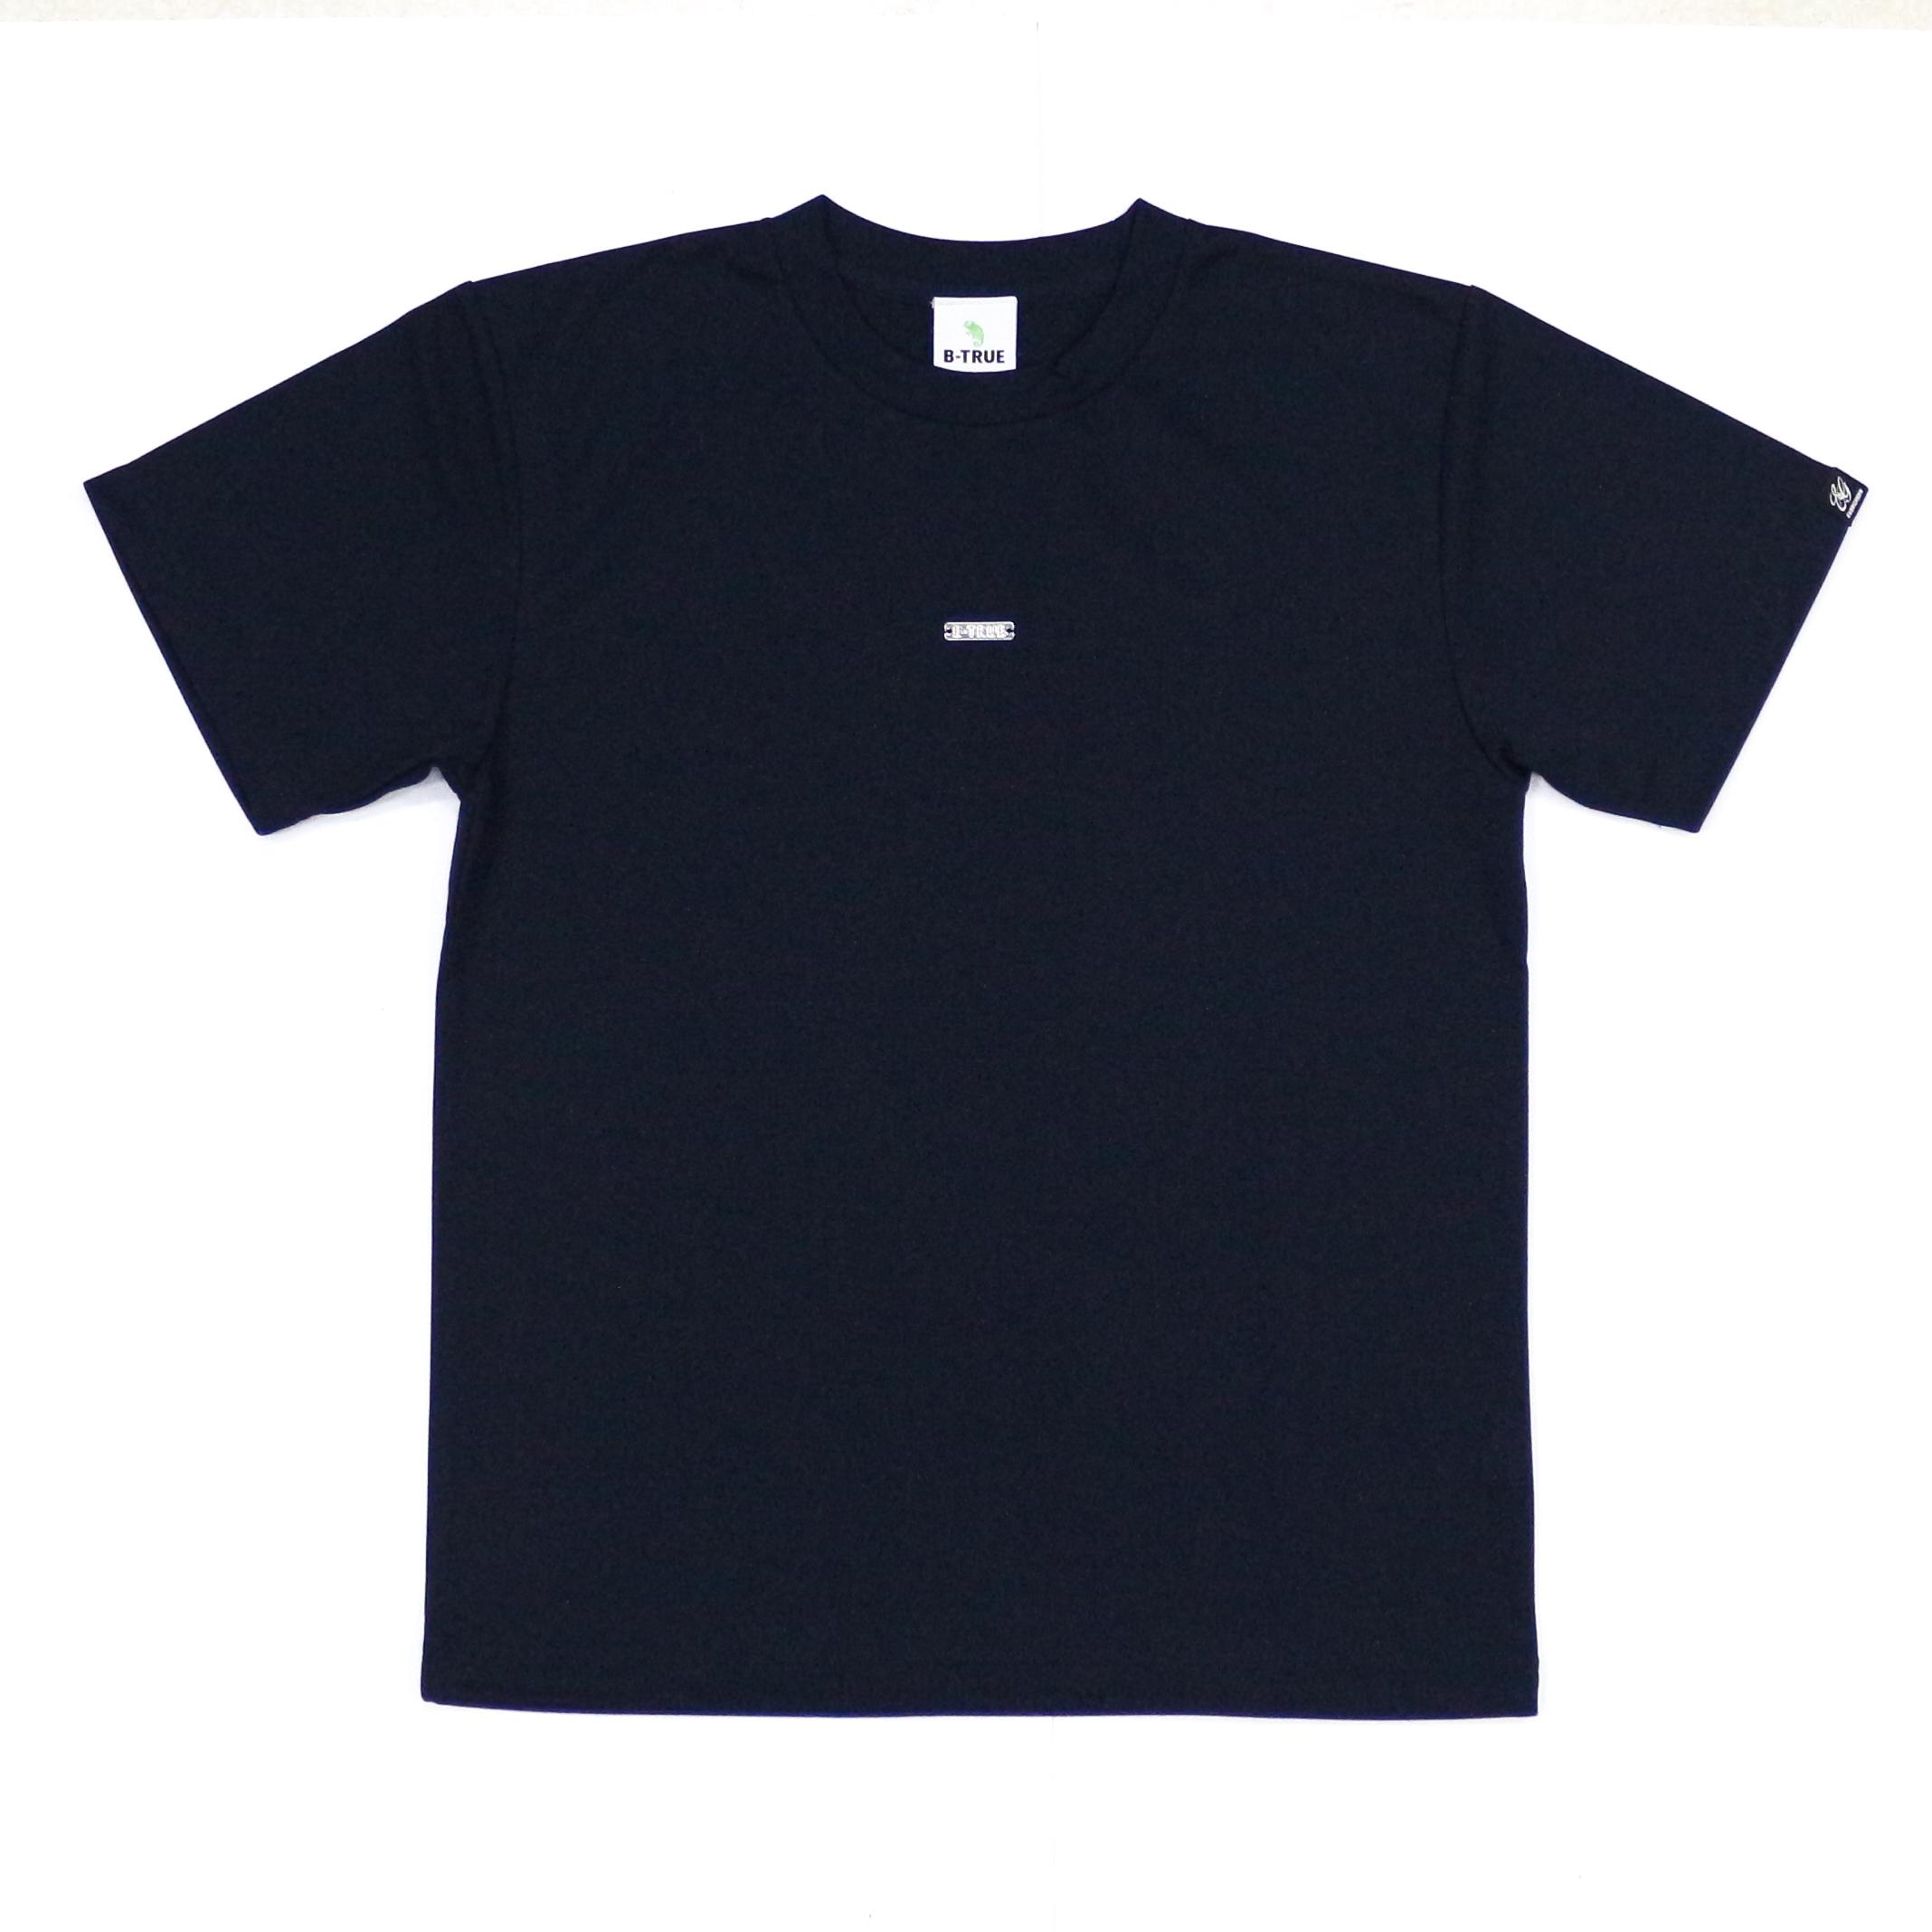 Sale Evergreen T-Shirt Dry Fit Short Sleeve B-True B Size M Navy (6437)